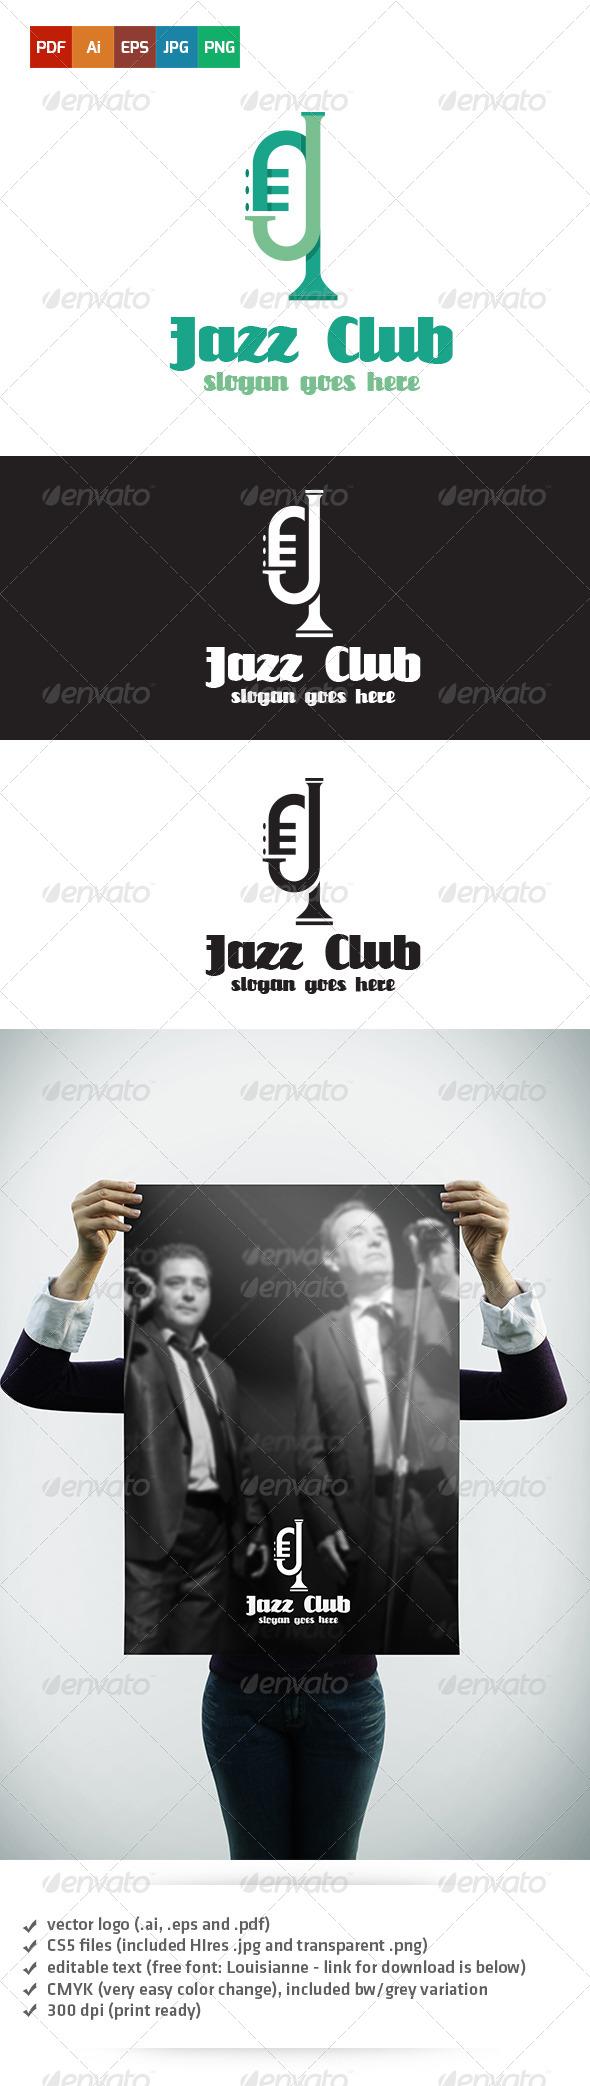 GraphicRiver Jazz Club Logo 5354221